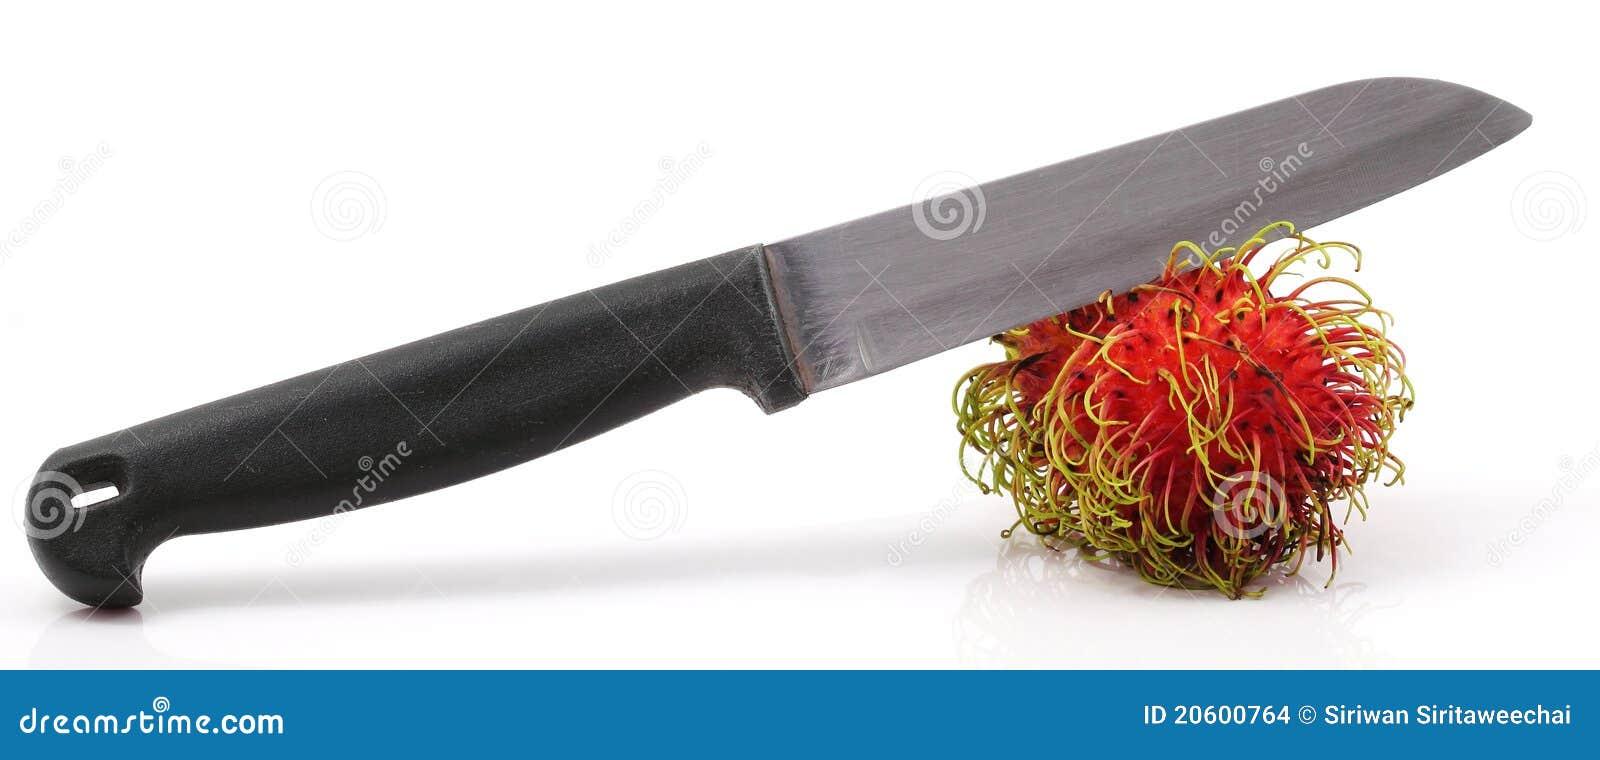 Rambutan imagenes de archivo imagen 20600764 for Cuchillo fruta